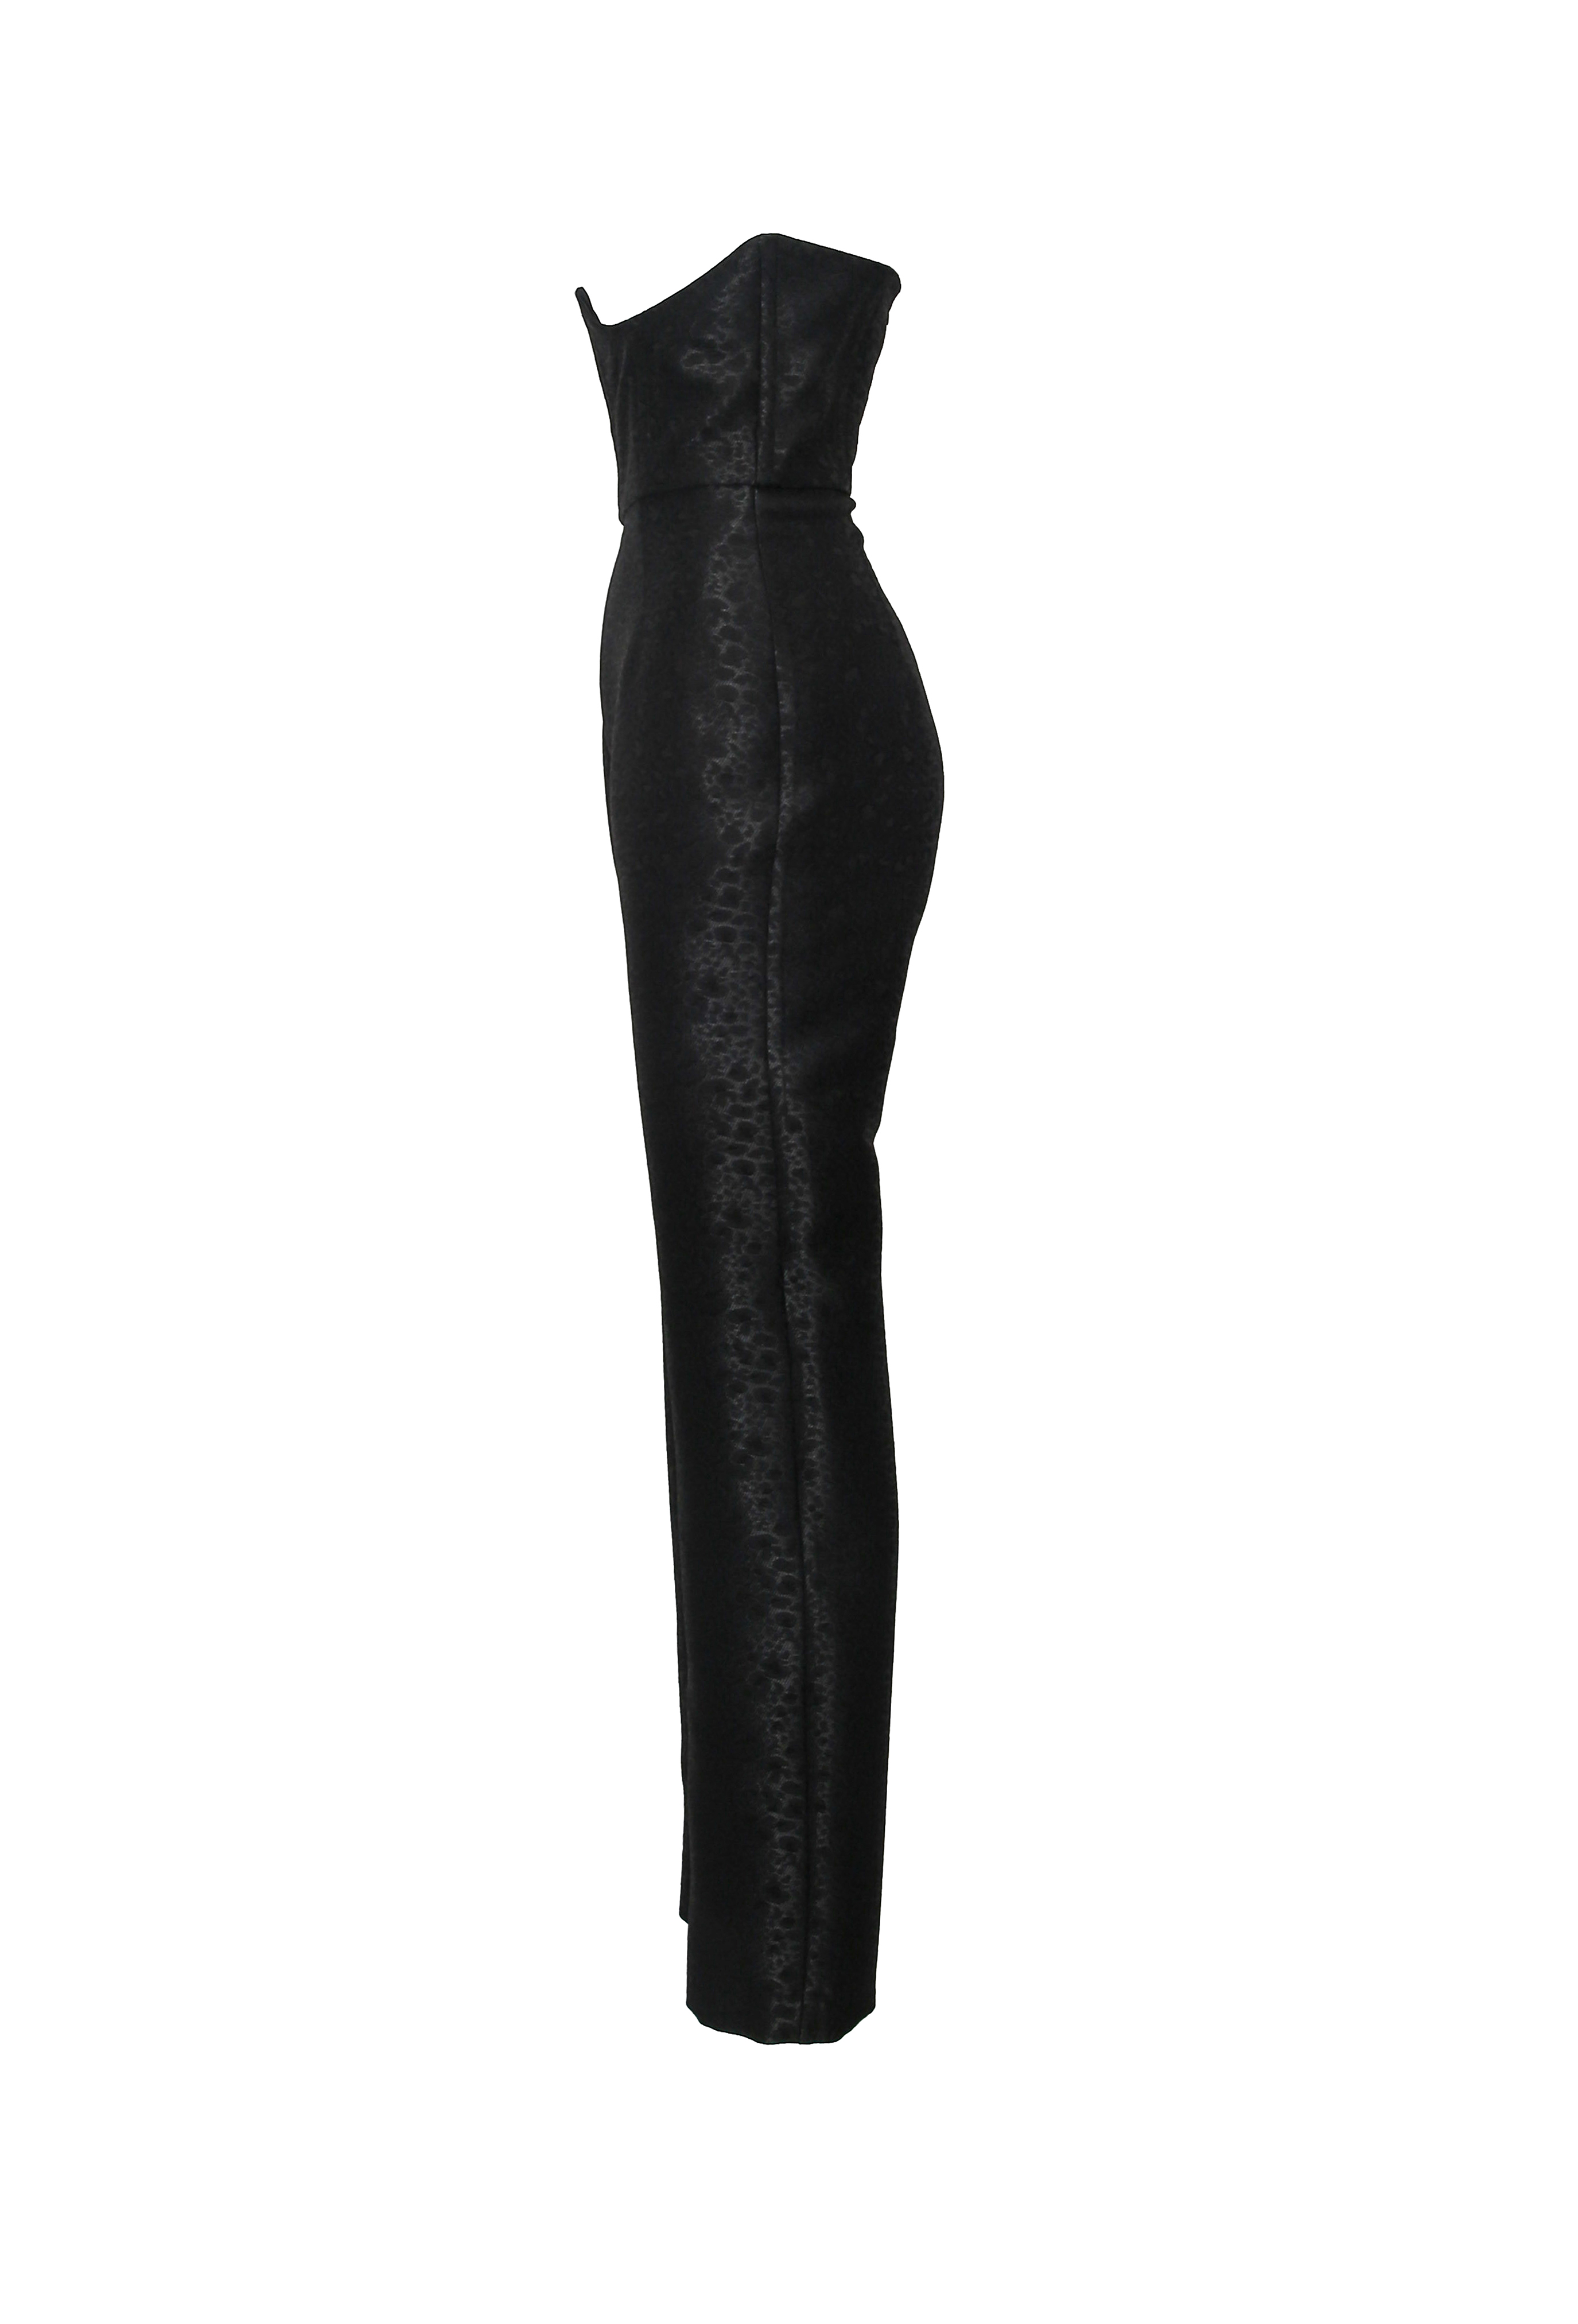 Textured Corset Pants